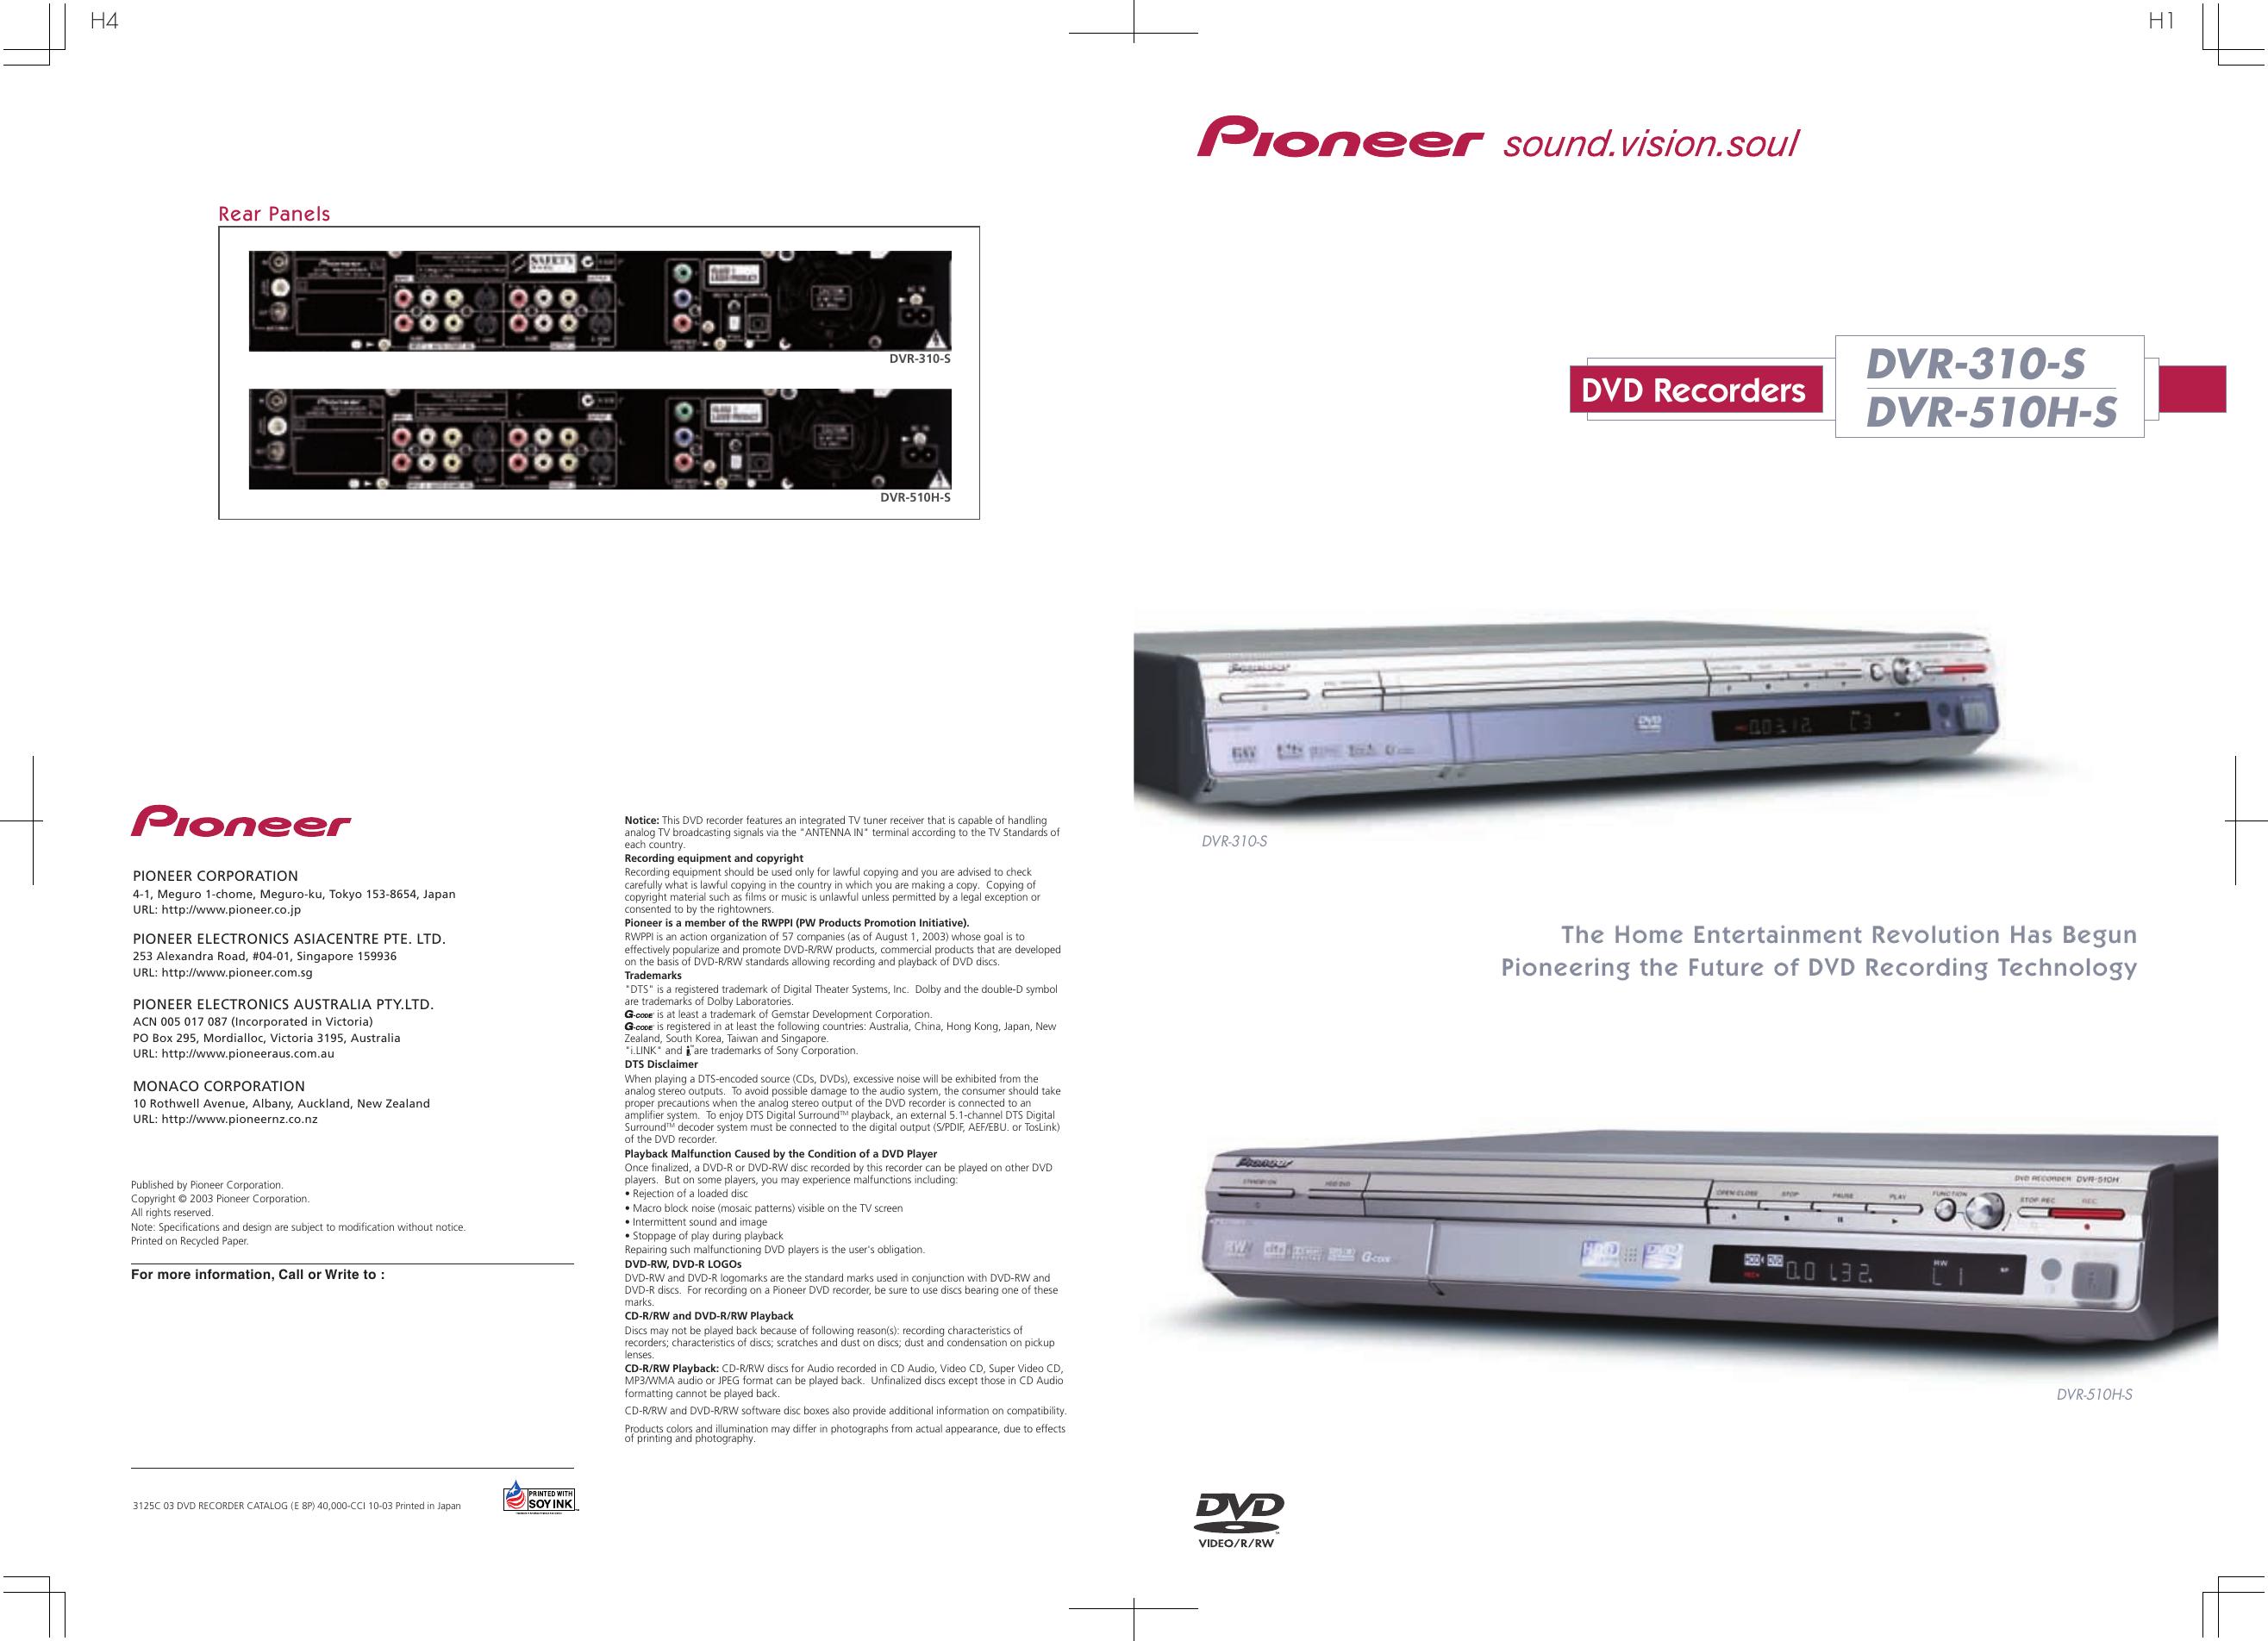 pioneer dvr 310 s users manual recorders rh usermanual wiki DVR Recorders Walmart Universal DVR Recorders